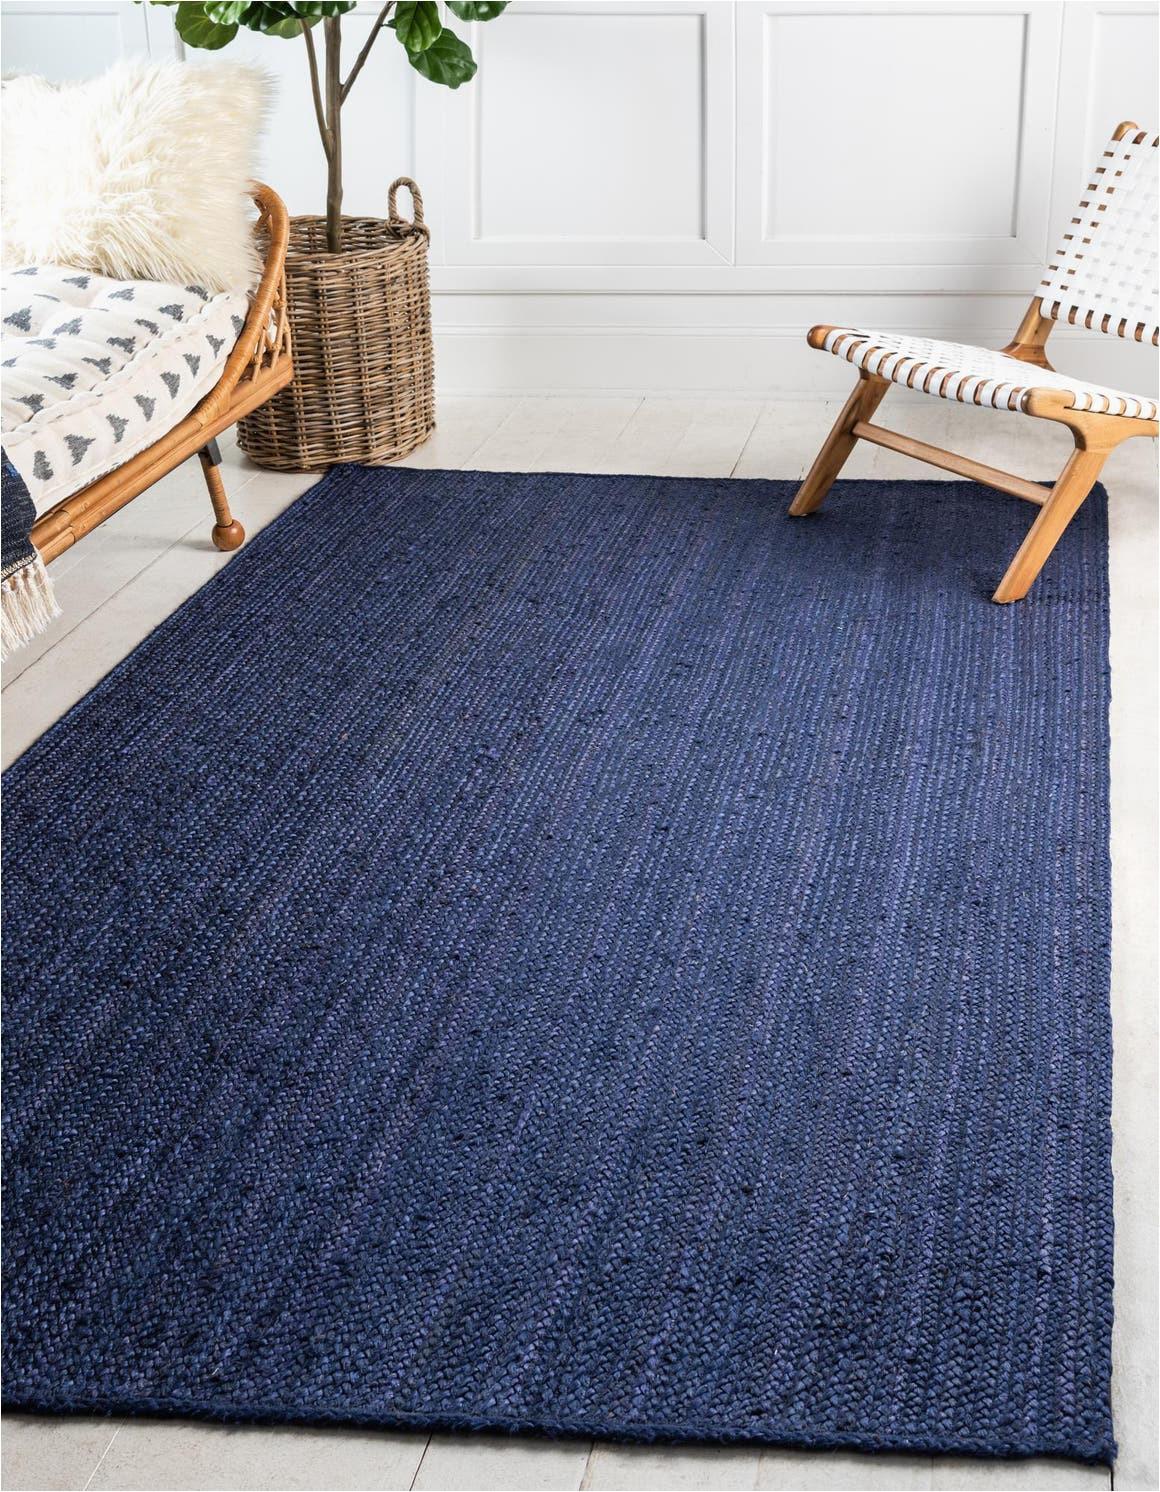 navy blue 5x8 braided jute area rug